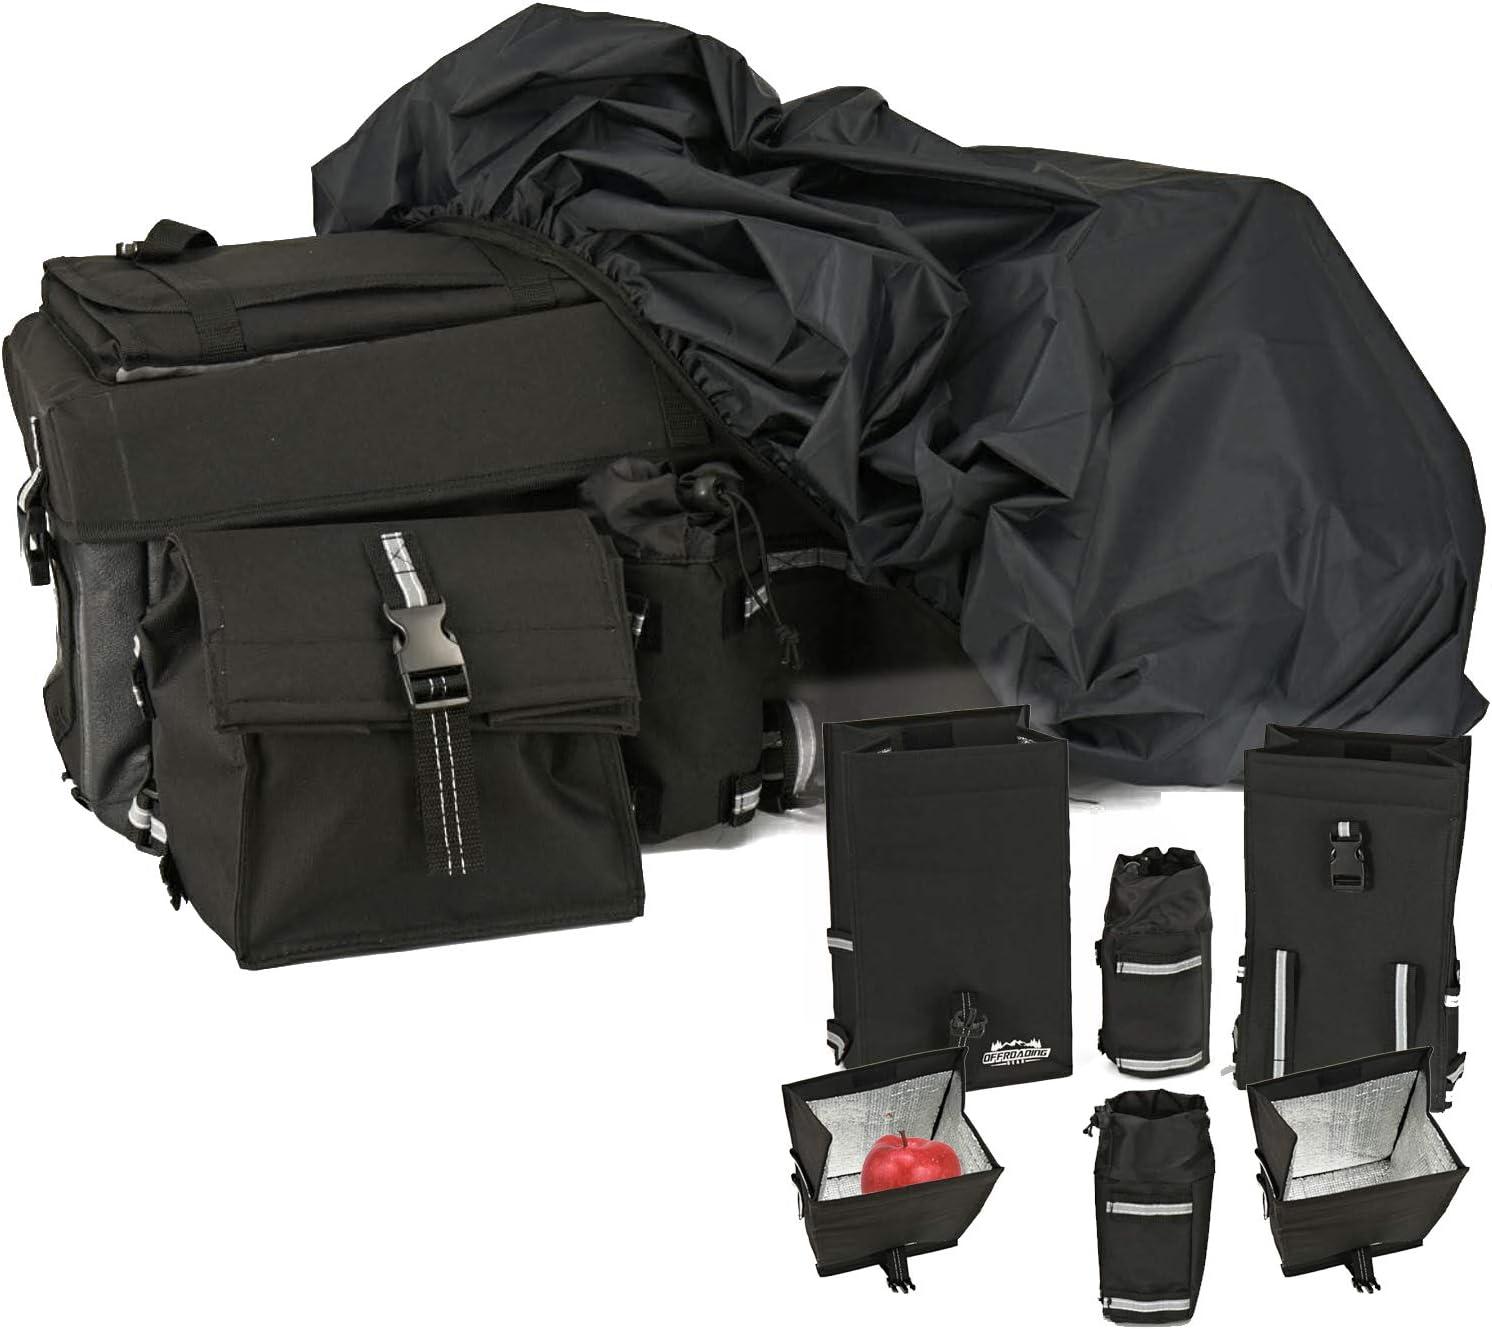 Offroading Gear ATV Rear Rack Bag